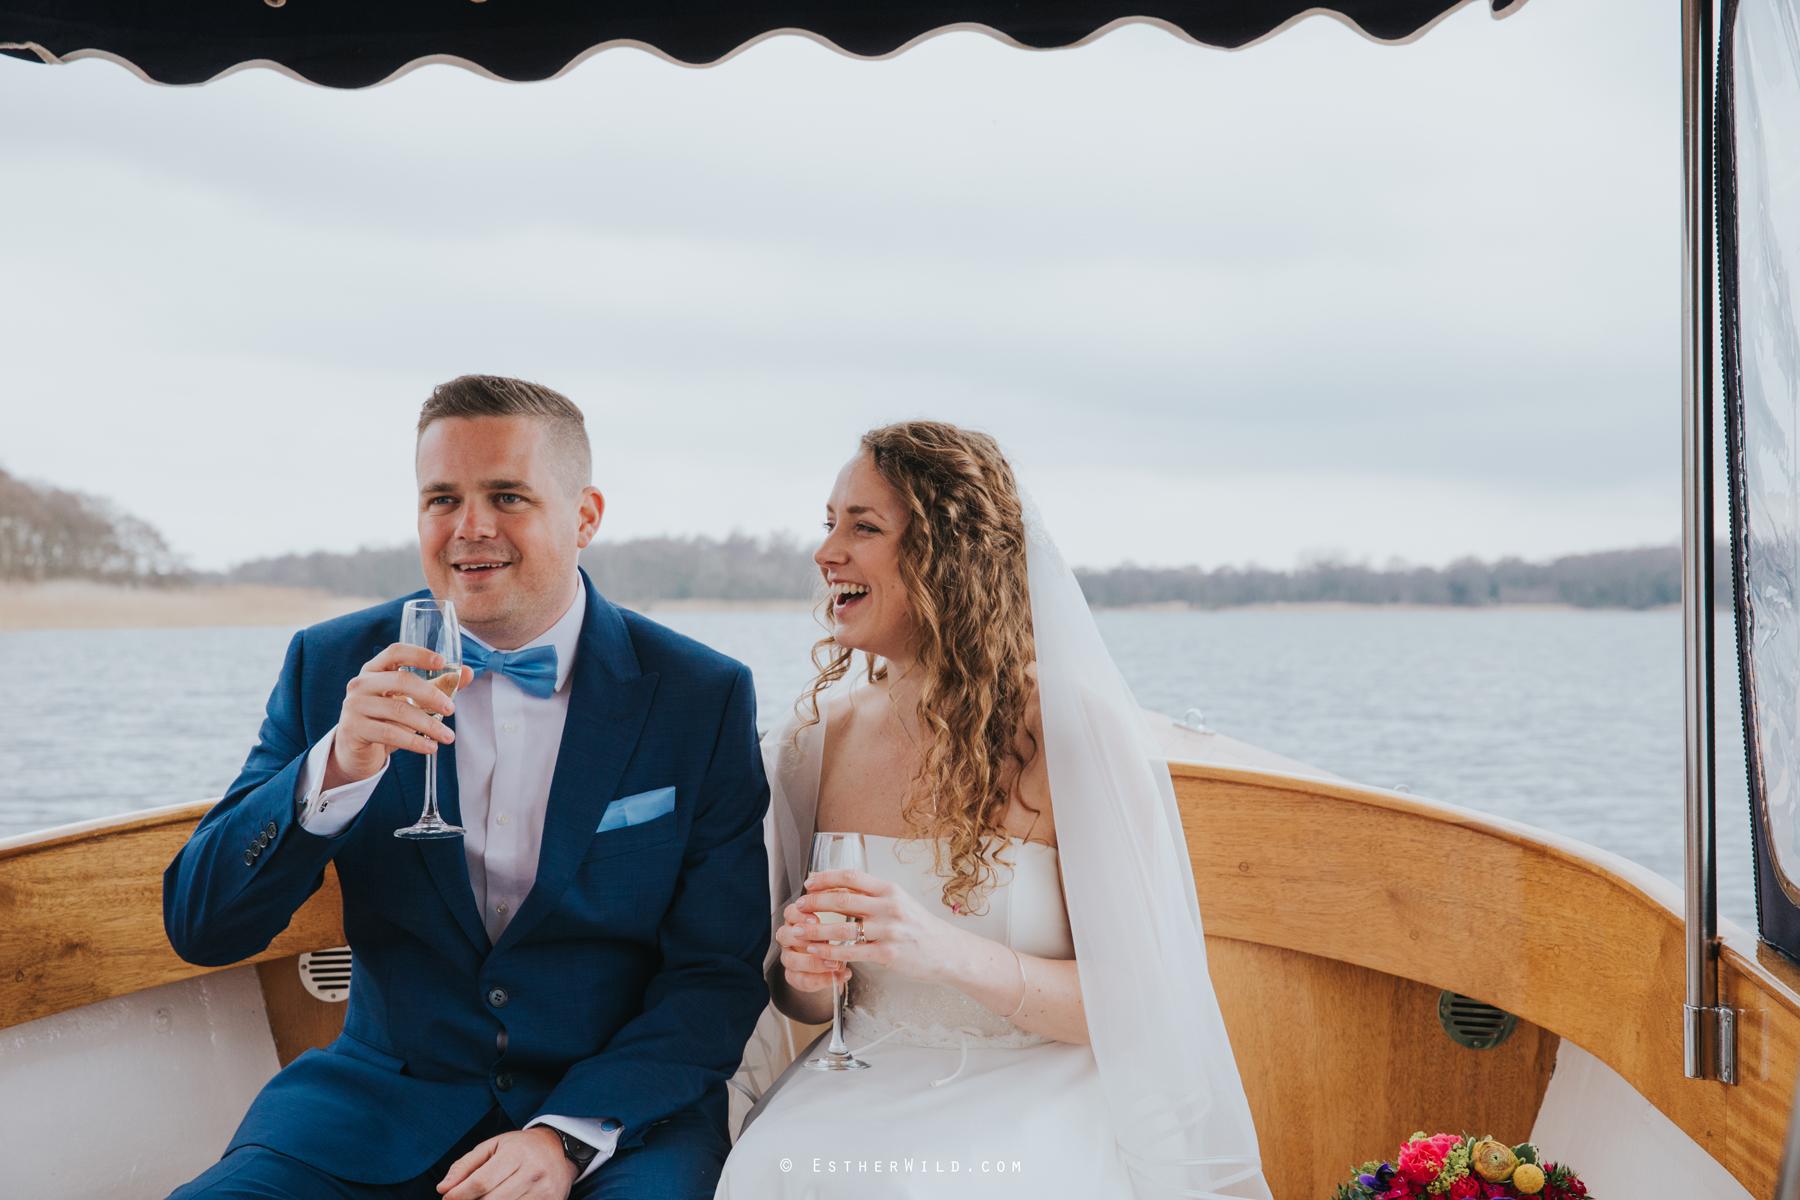 The_BoatHouse_Wedding_Venue_Ormesby_Norfolk_Broads_Boat_Wedding_Photography_Esther_Wild_Photographer_IMG_1485.jpg